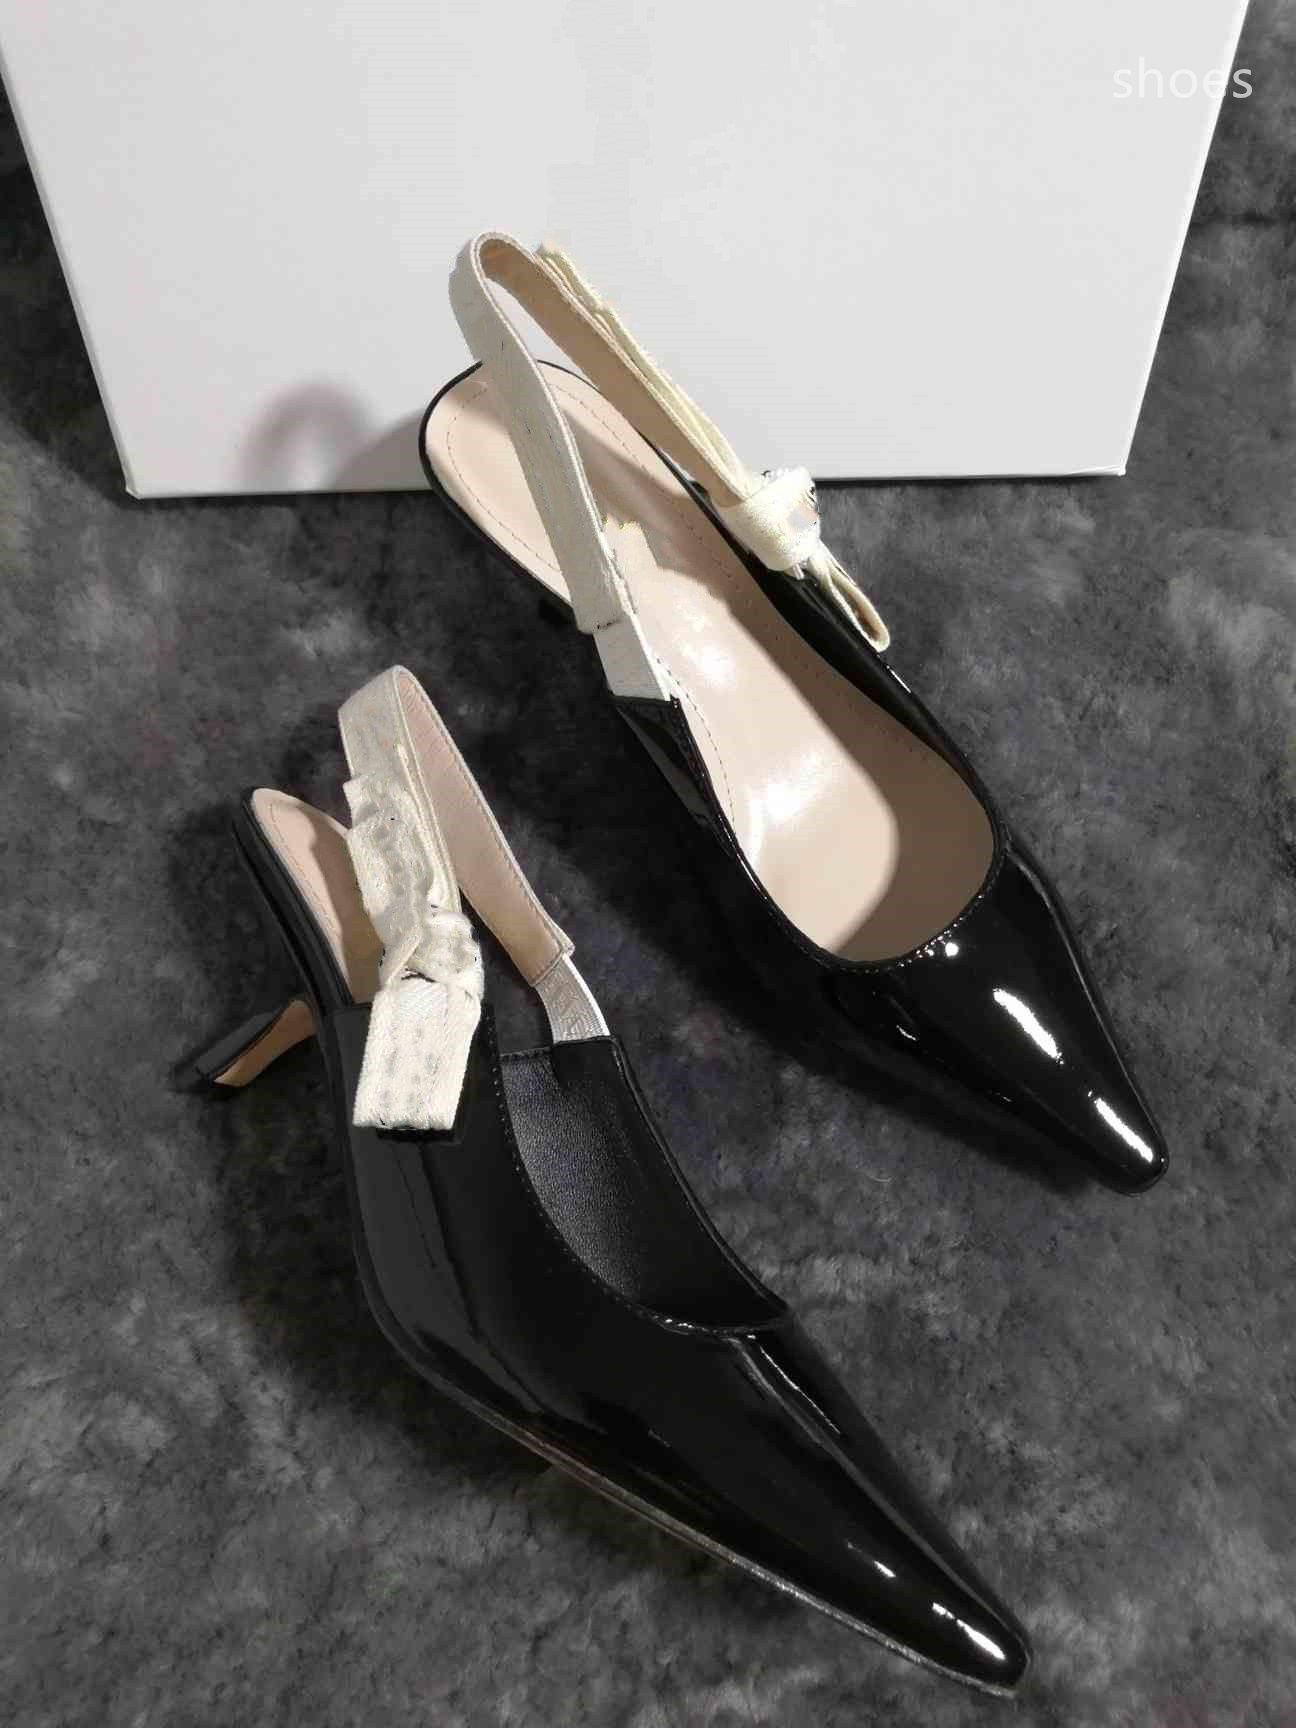 O novo 2021 vestido Shoes Party Office Universal High Saltos Moda Versátil Senhoras Sapatos de Designer de Luxo F5HG